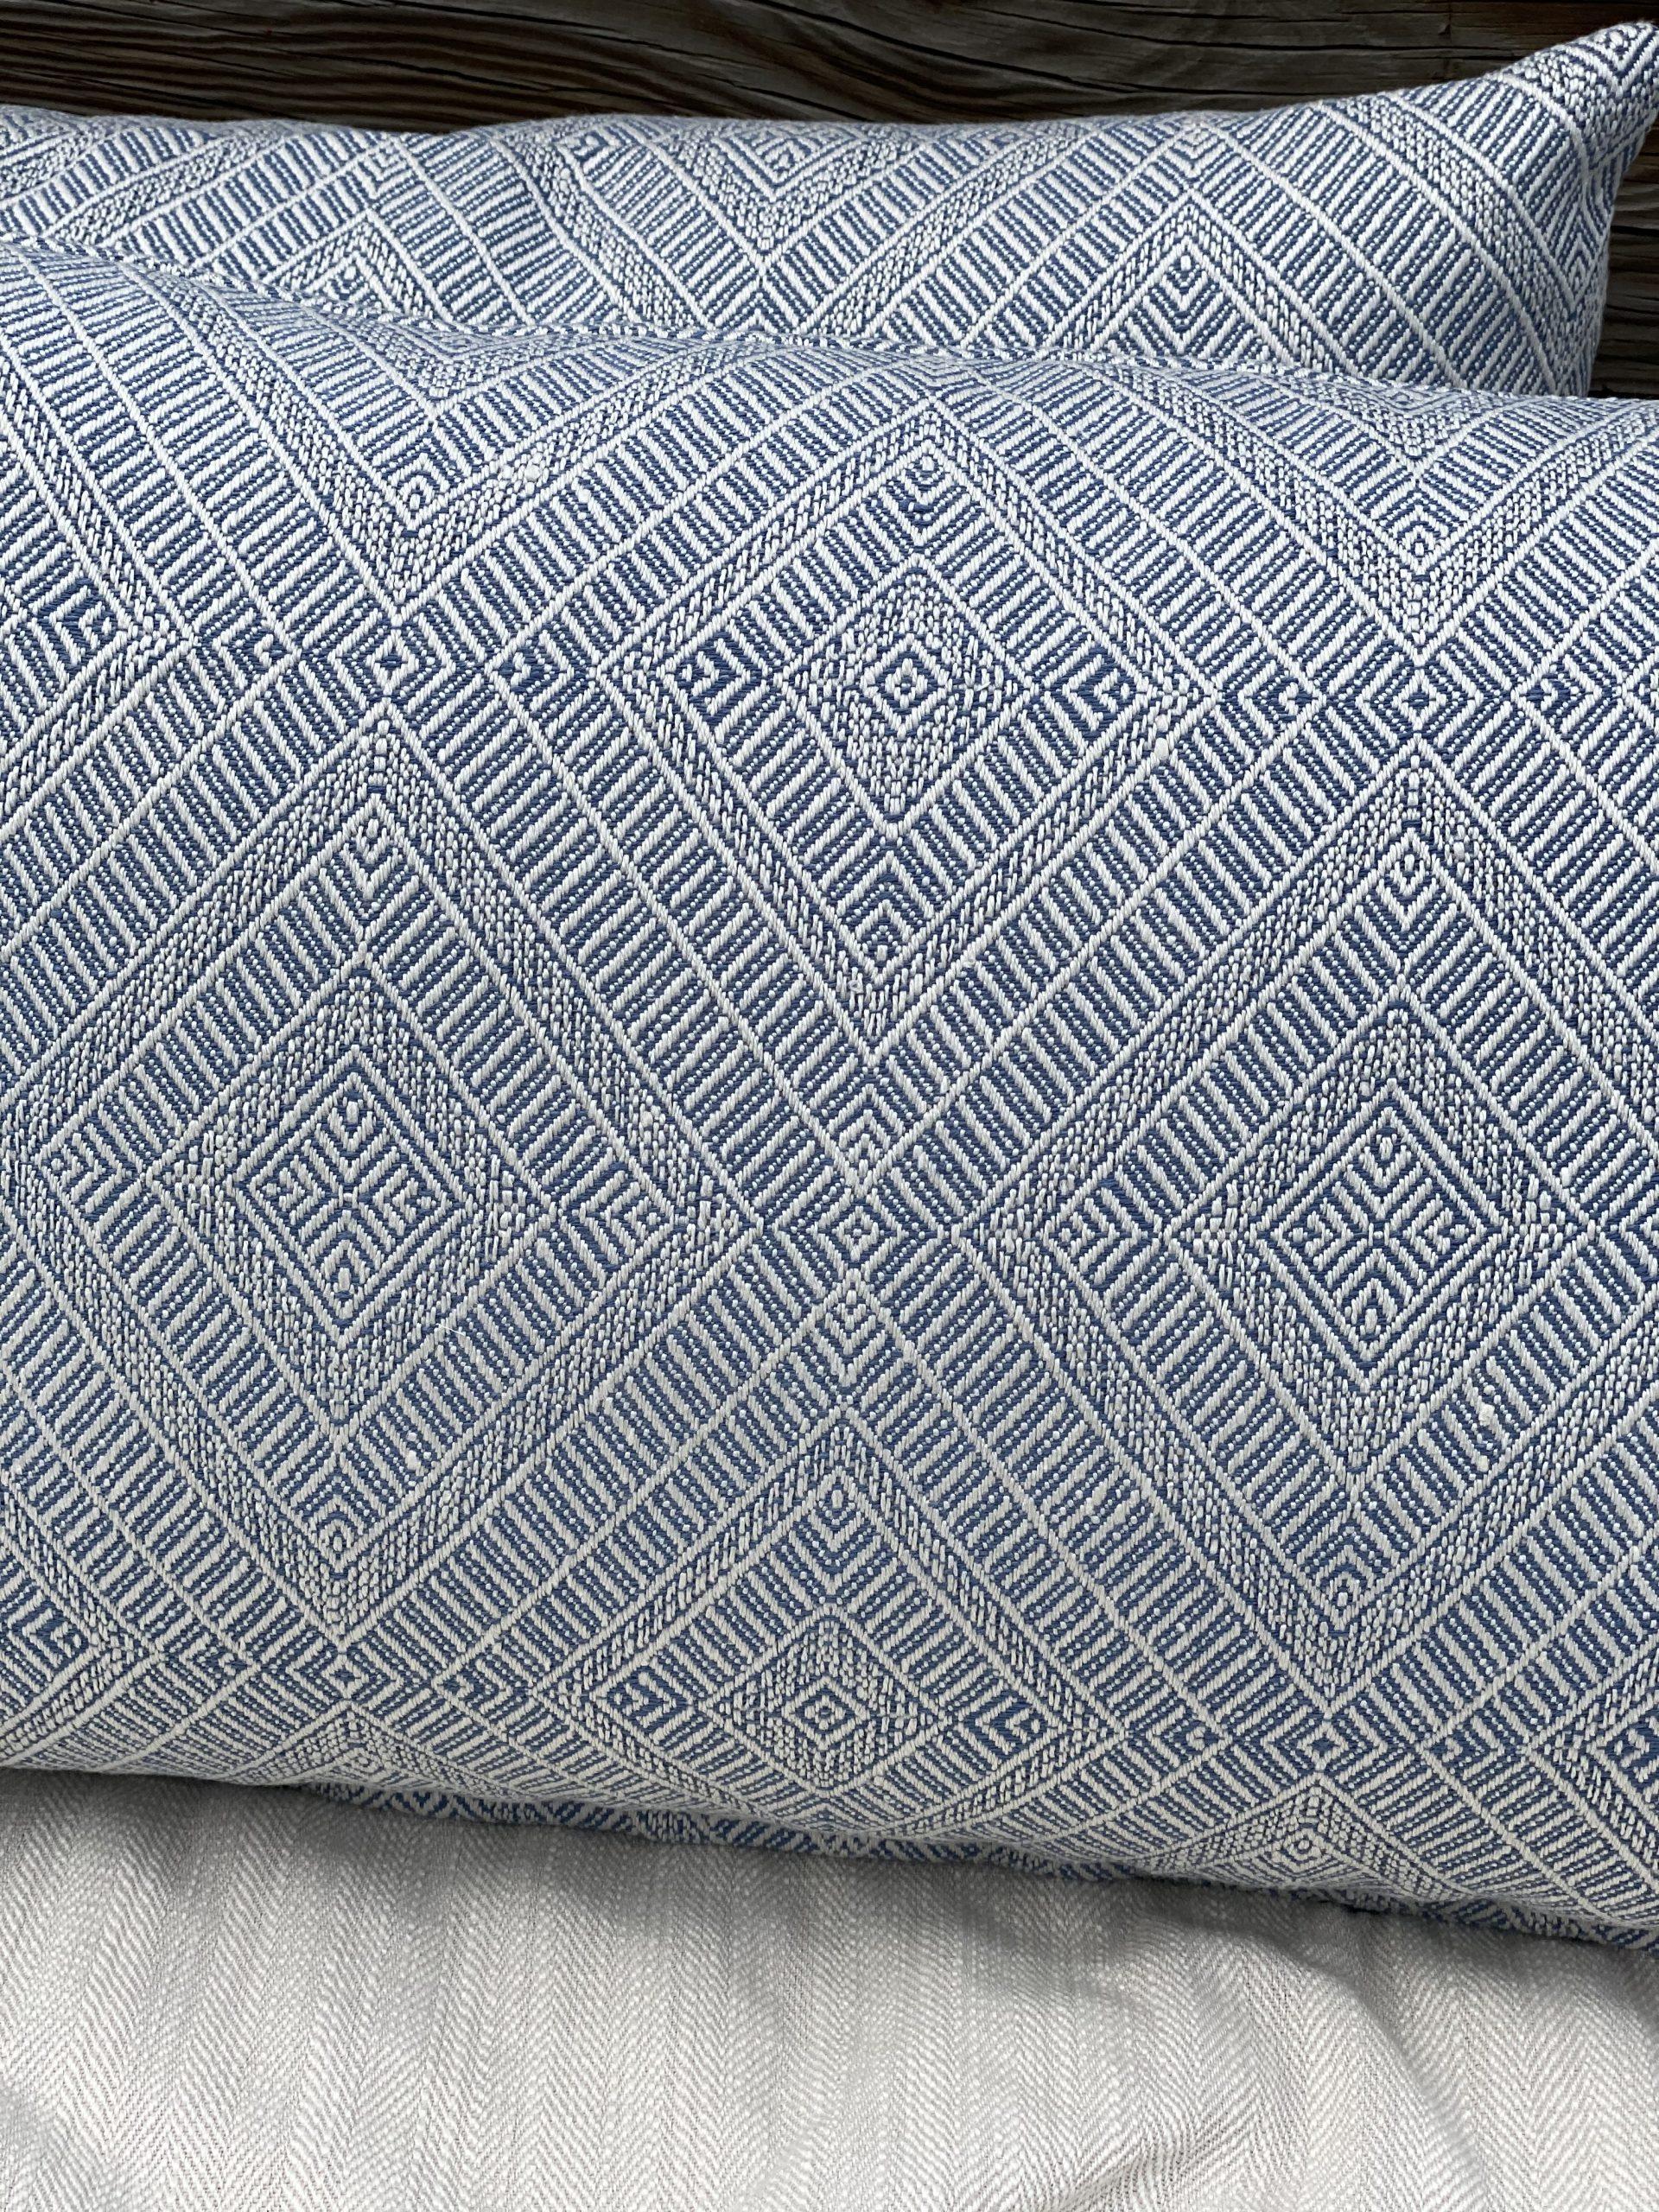 Outdoor Geometric Pillows